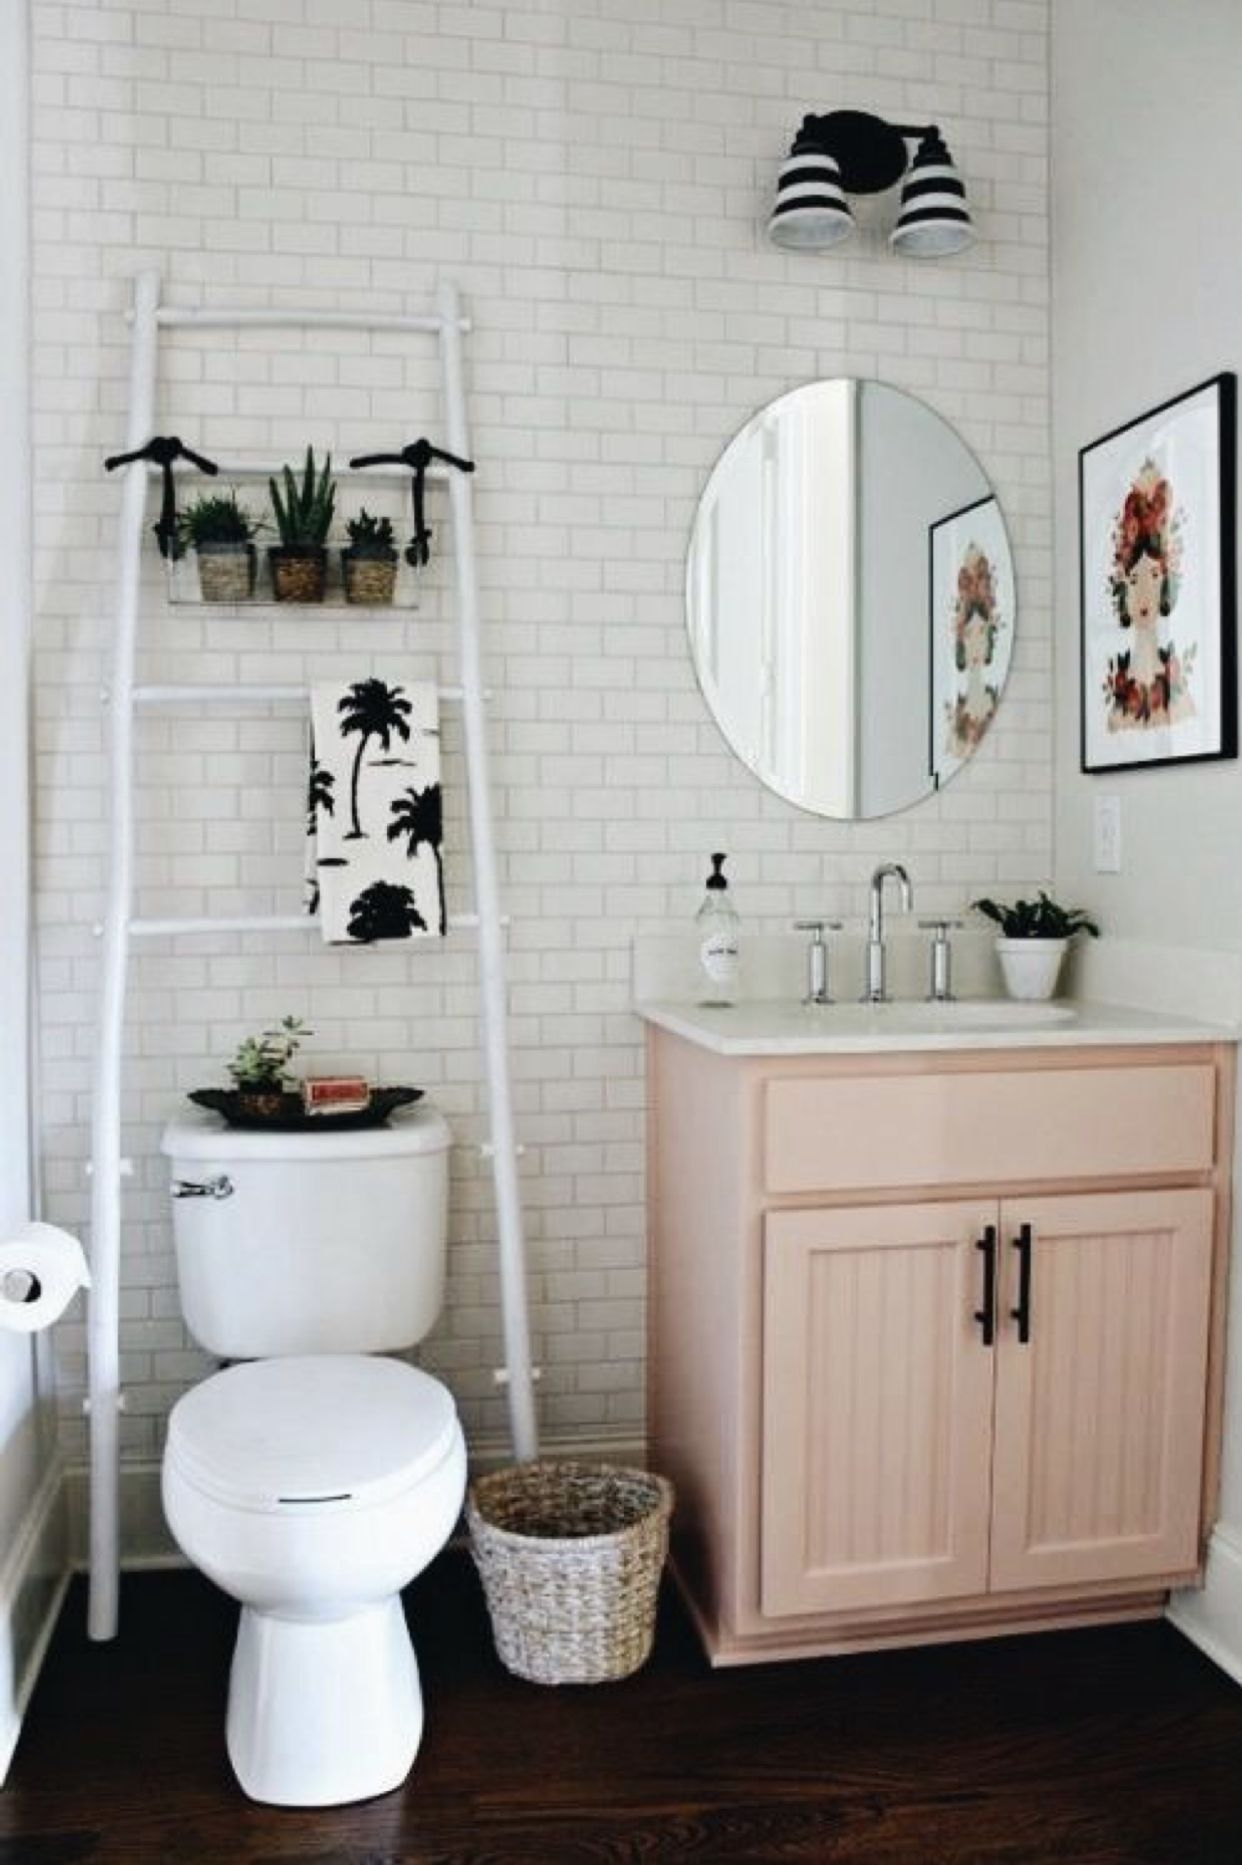 Pinterest Iѕavyeℓℓa ℓiaig Diy Bathroom Small Bathroom Diy